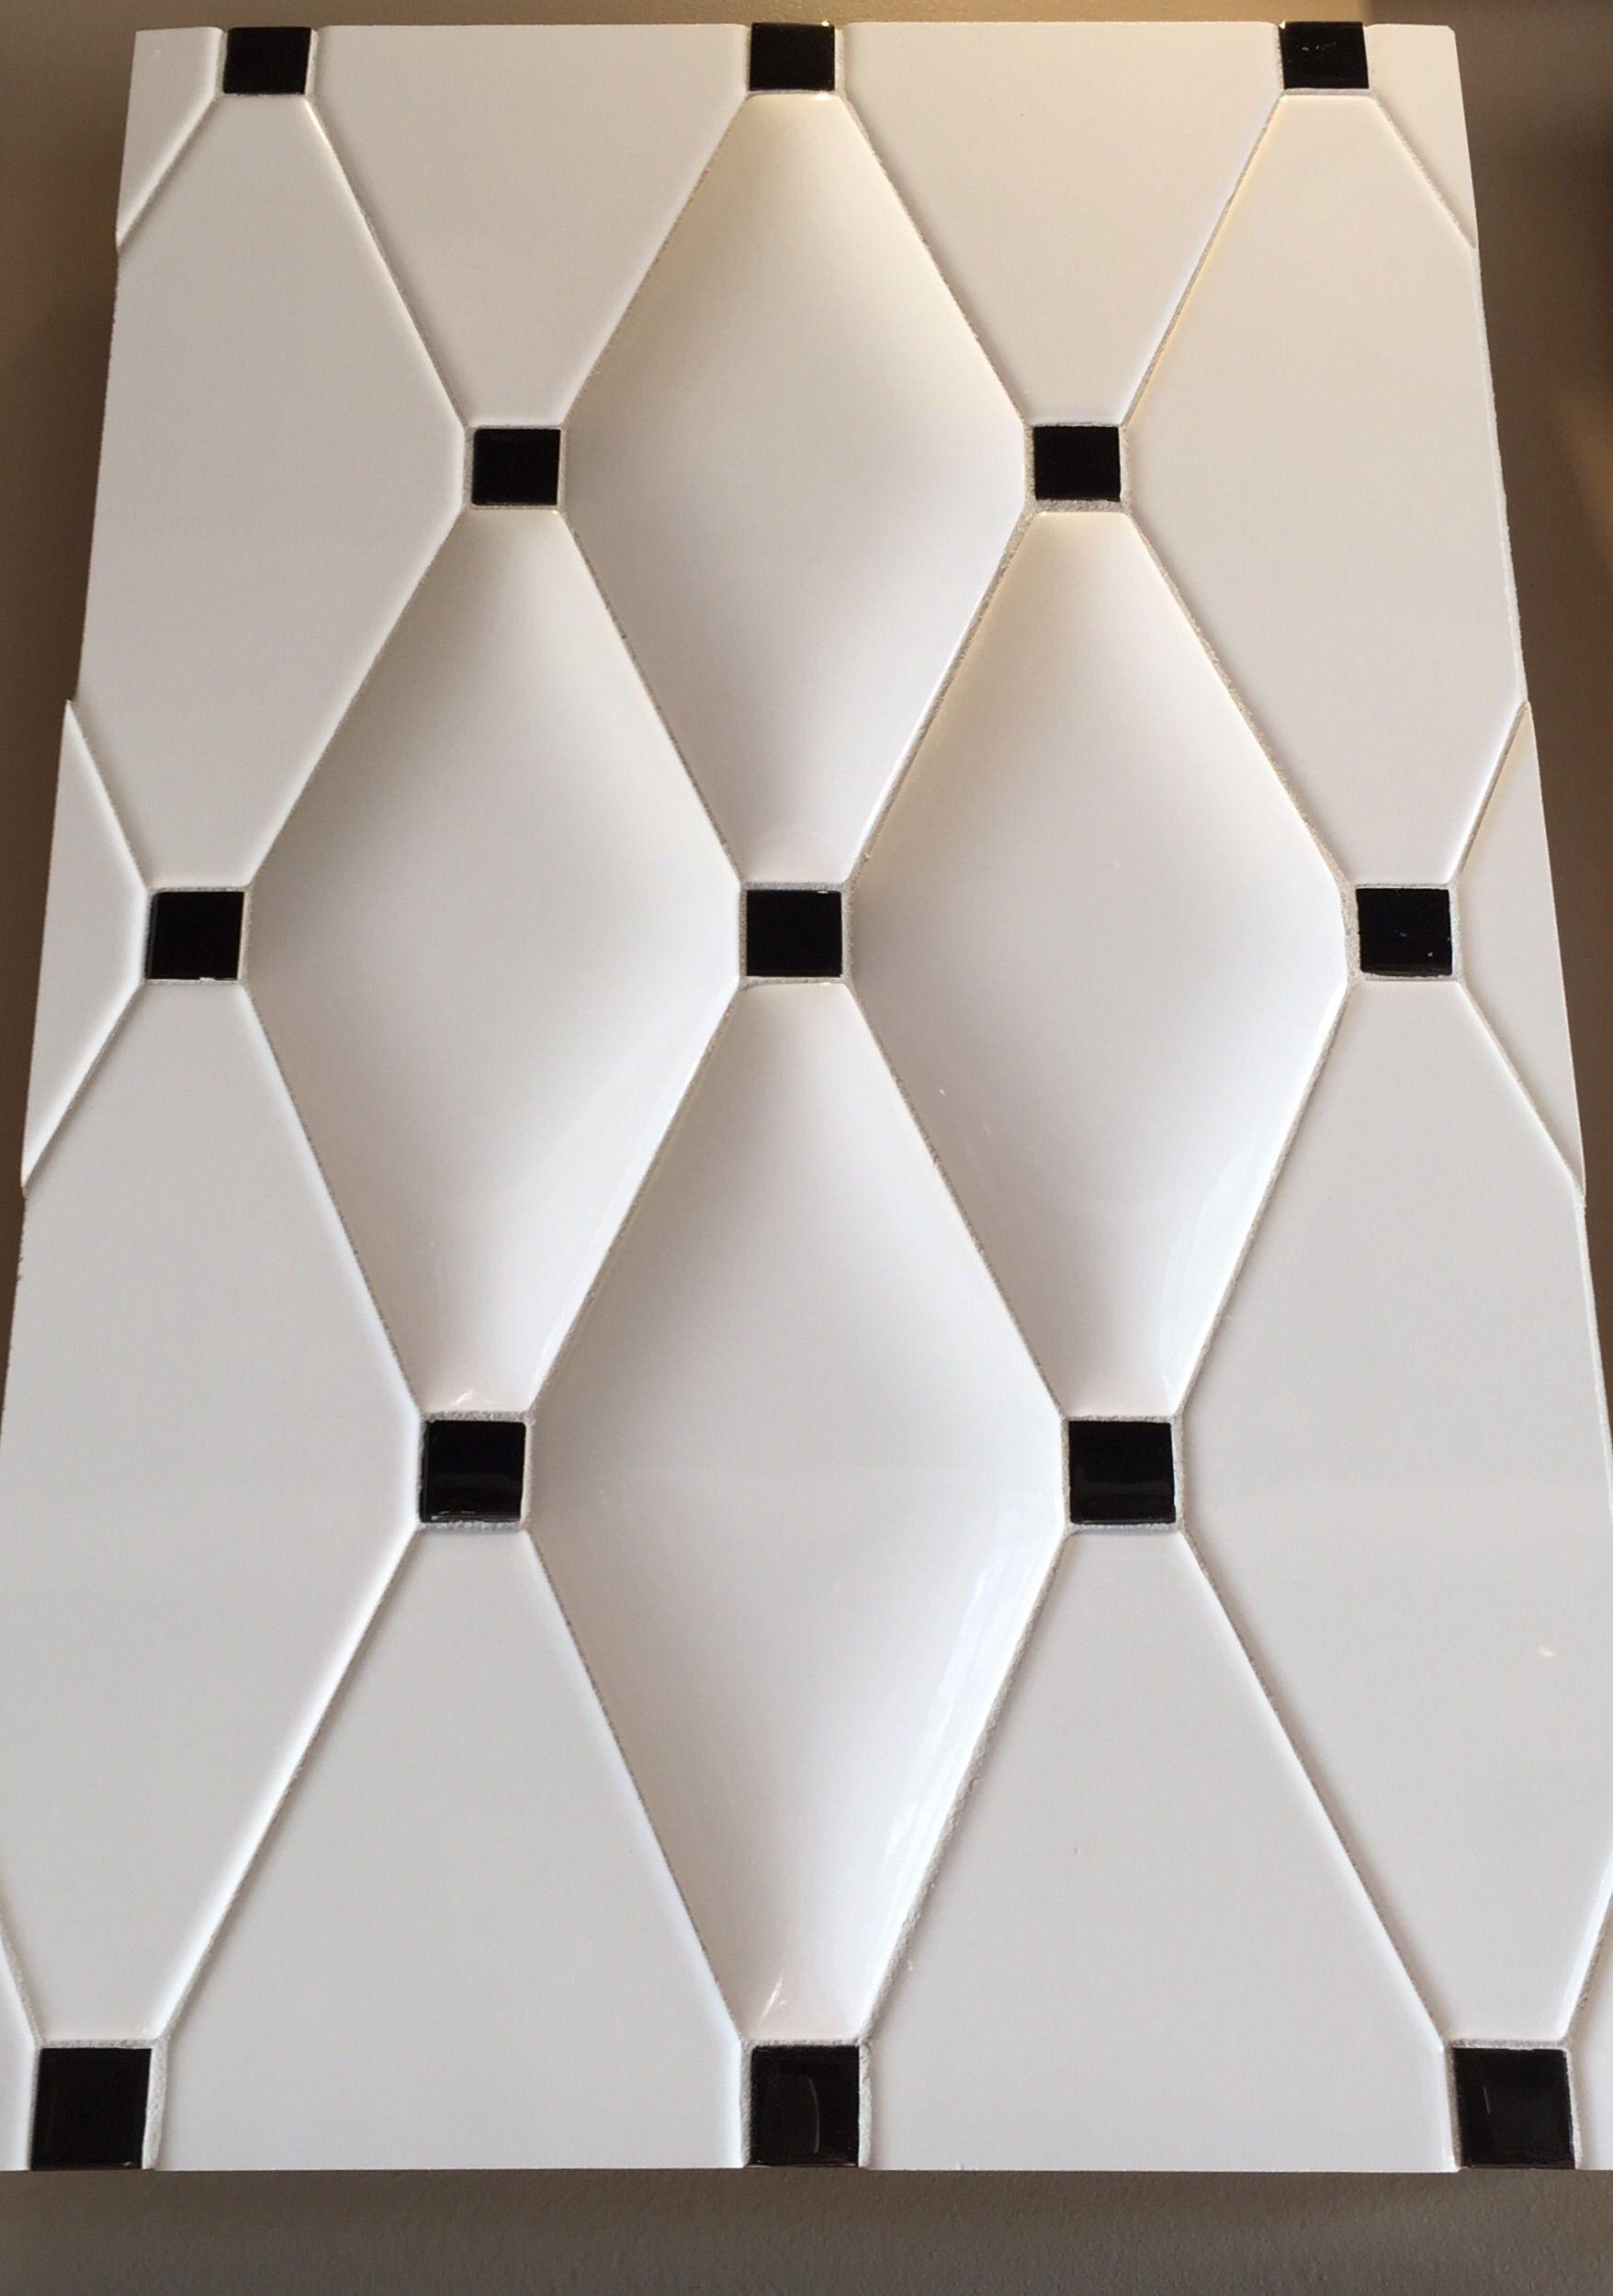 8x4 Pillow Diamond Shape Ceramic Tiles Also 8x4 Flat Diamonds Black Accent Dots Diamond Pillows Ceramic Tiles Diamond Shapes